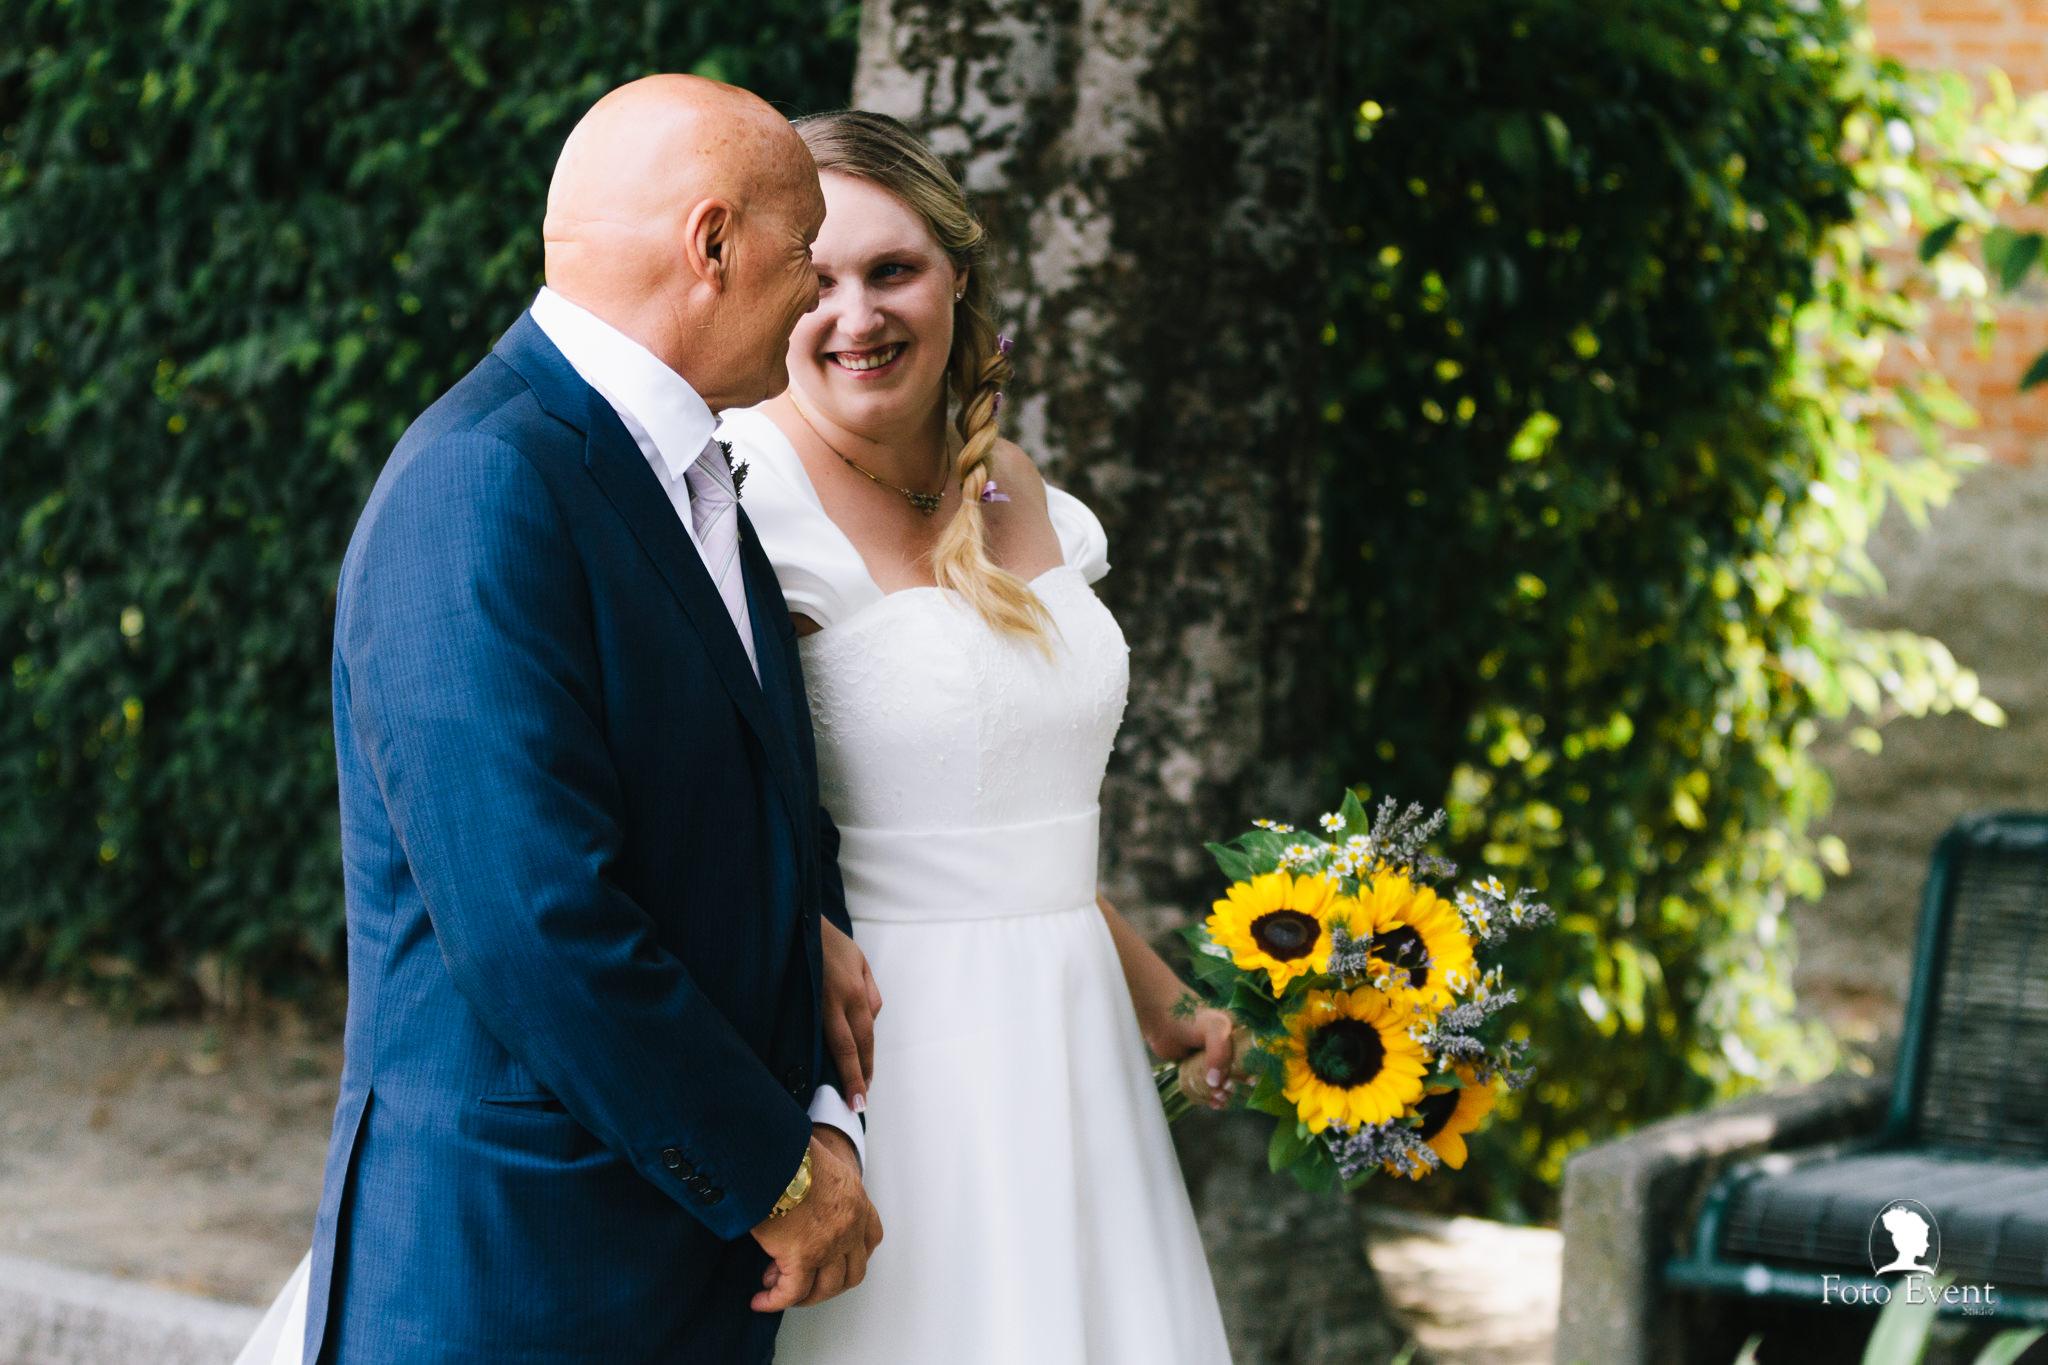 037-2019-07-27-Matrimonio-Valentina-e-Alessandro-Pettinari-zoom-259